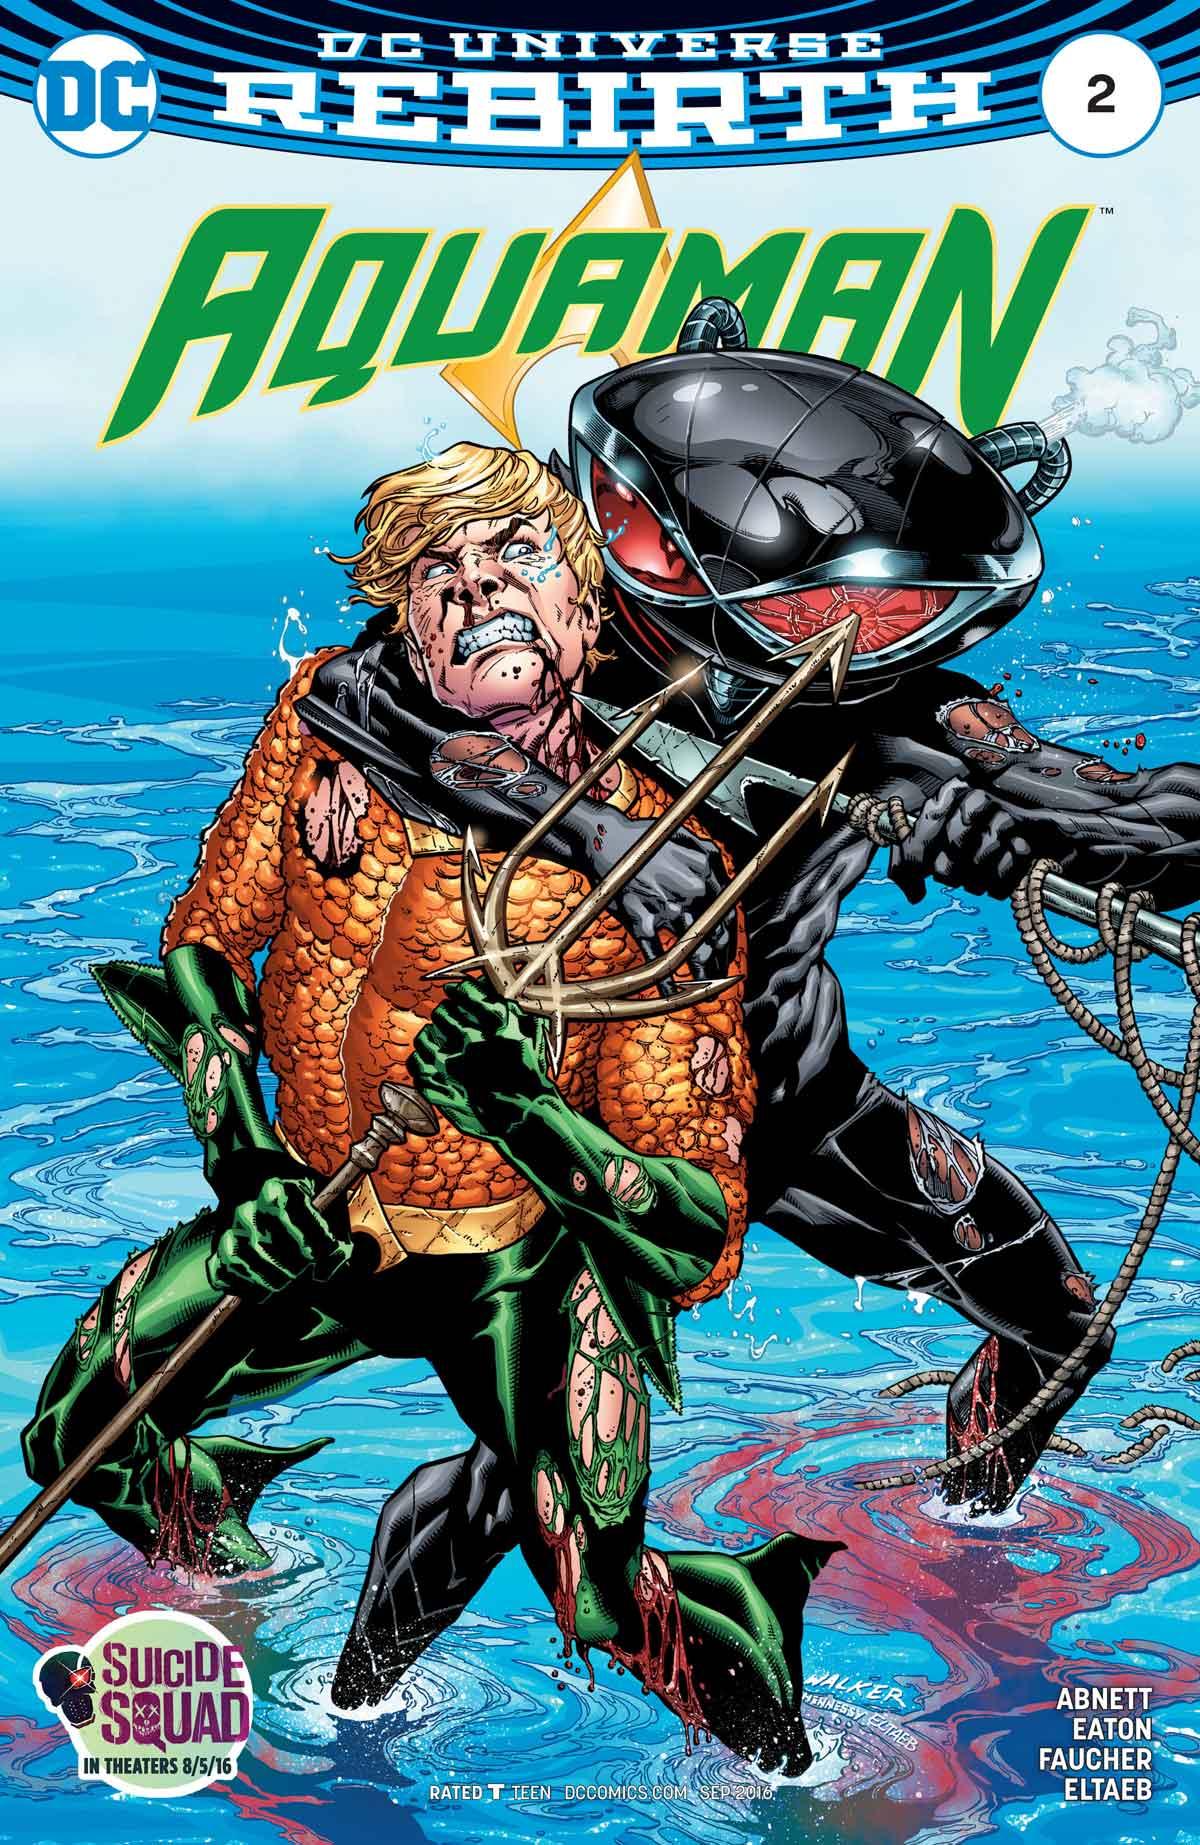 Aquaman #2 by Dan Abnett, Scot Eaton, Wayne Faucher, Gabe Eltaeb, and more